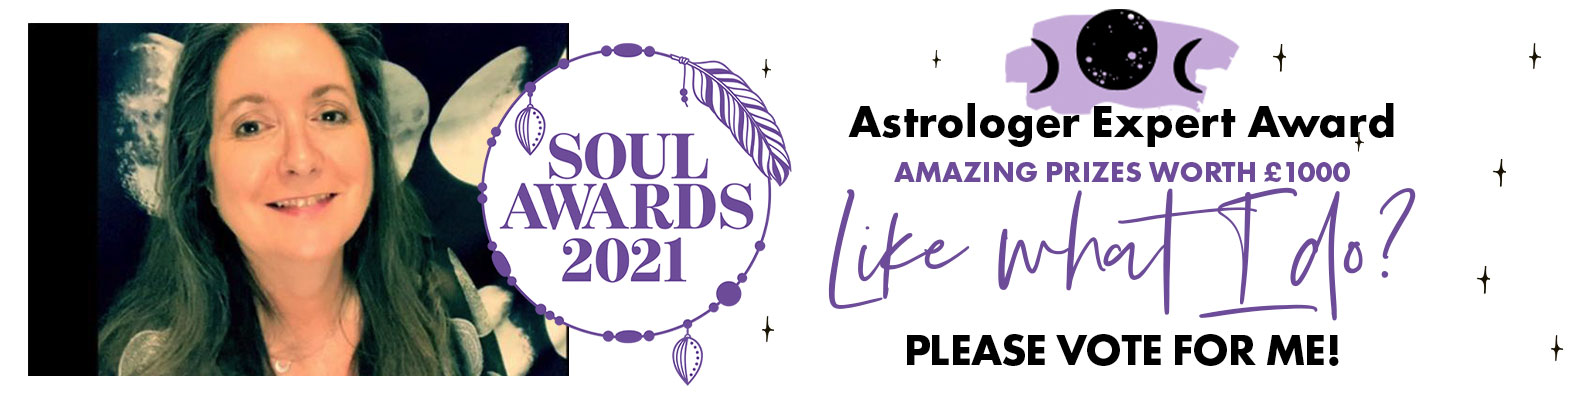 Sould Awards 2021 - Home